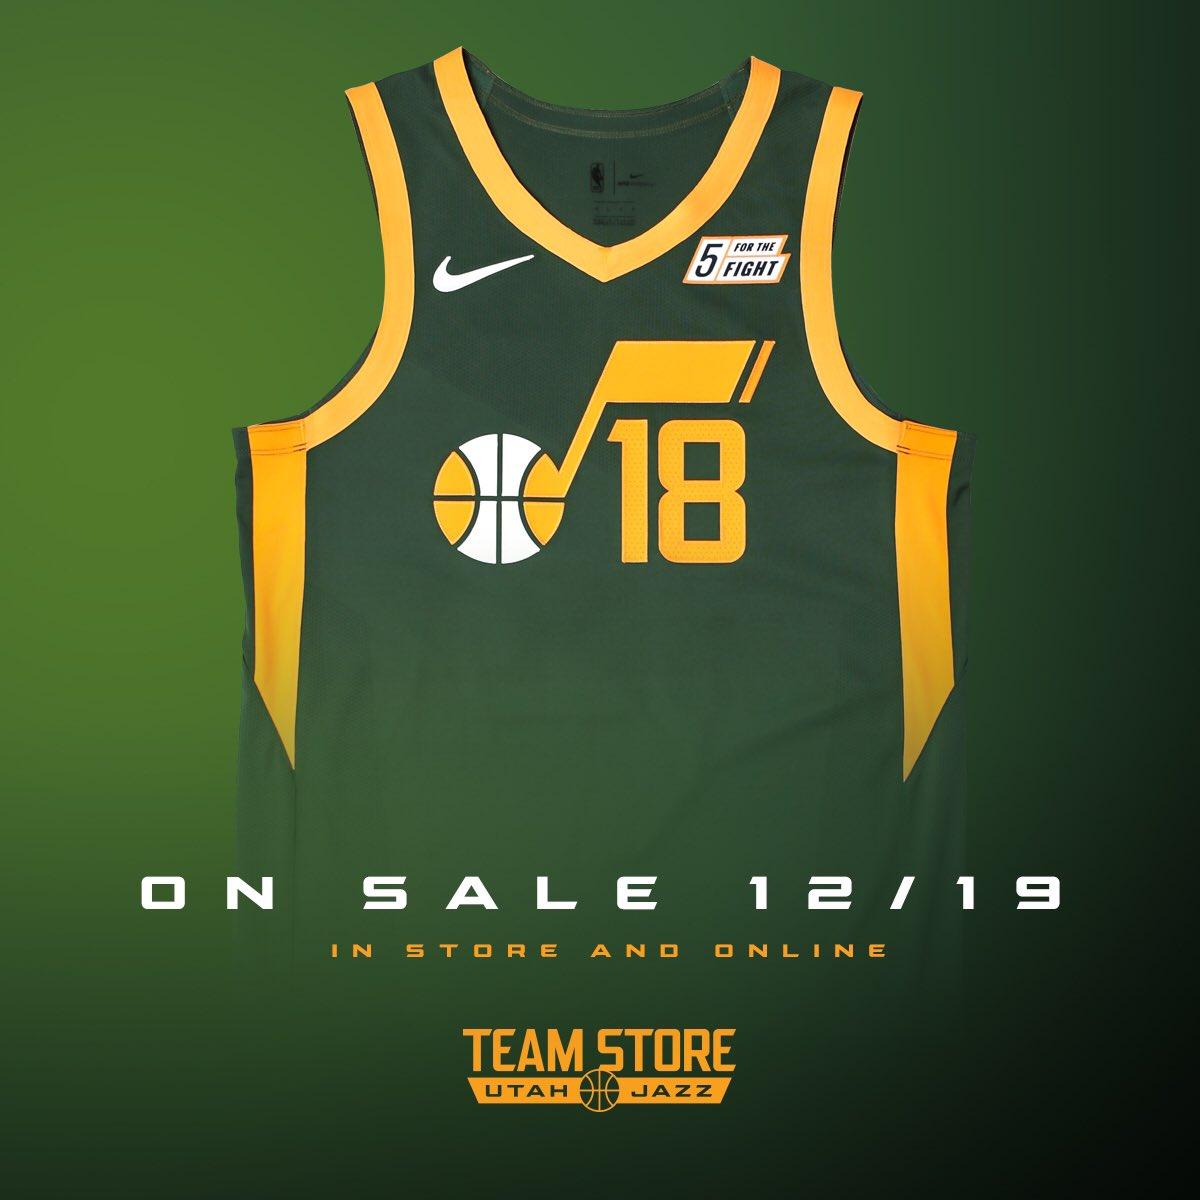 brand new 3c407 e0120 Utah Jazz Team Store on Twitter: